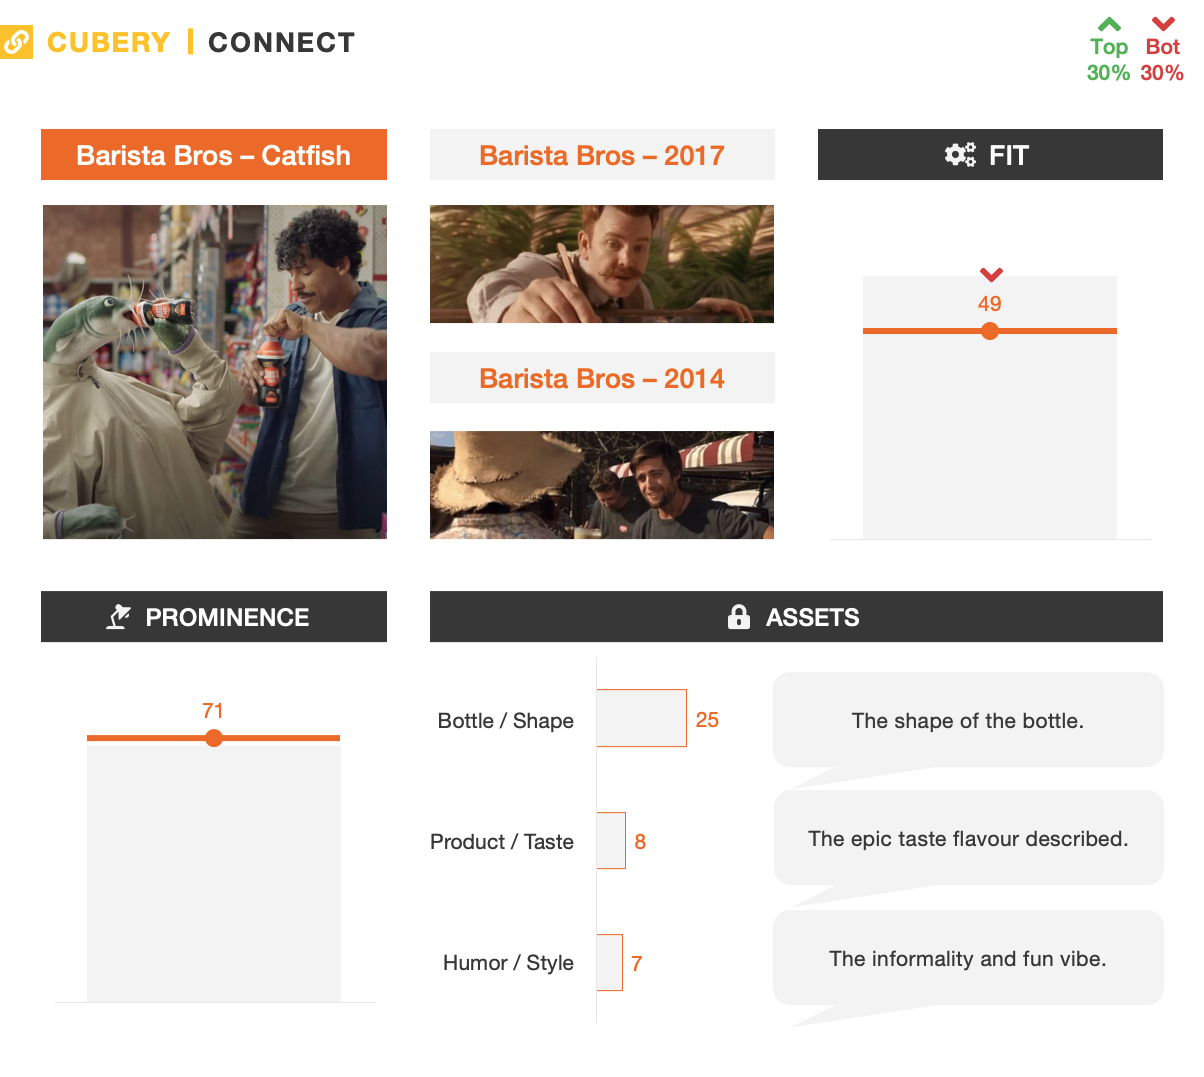 Barista Bros Catfish - Advertising Testing - Connect